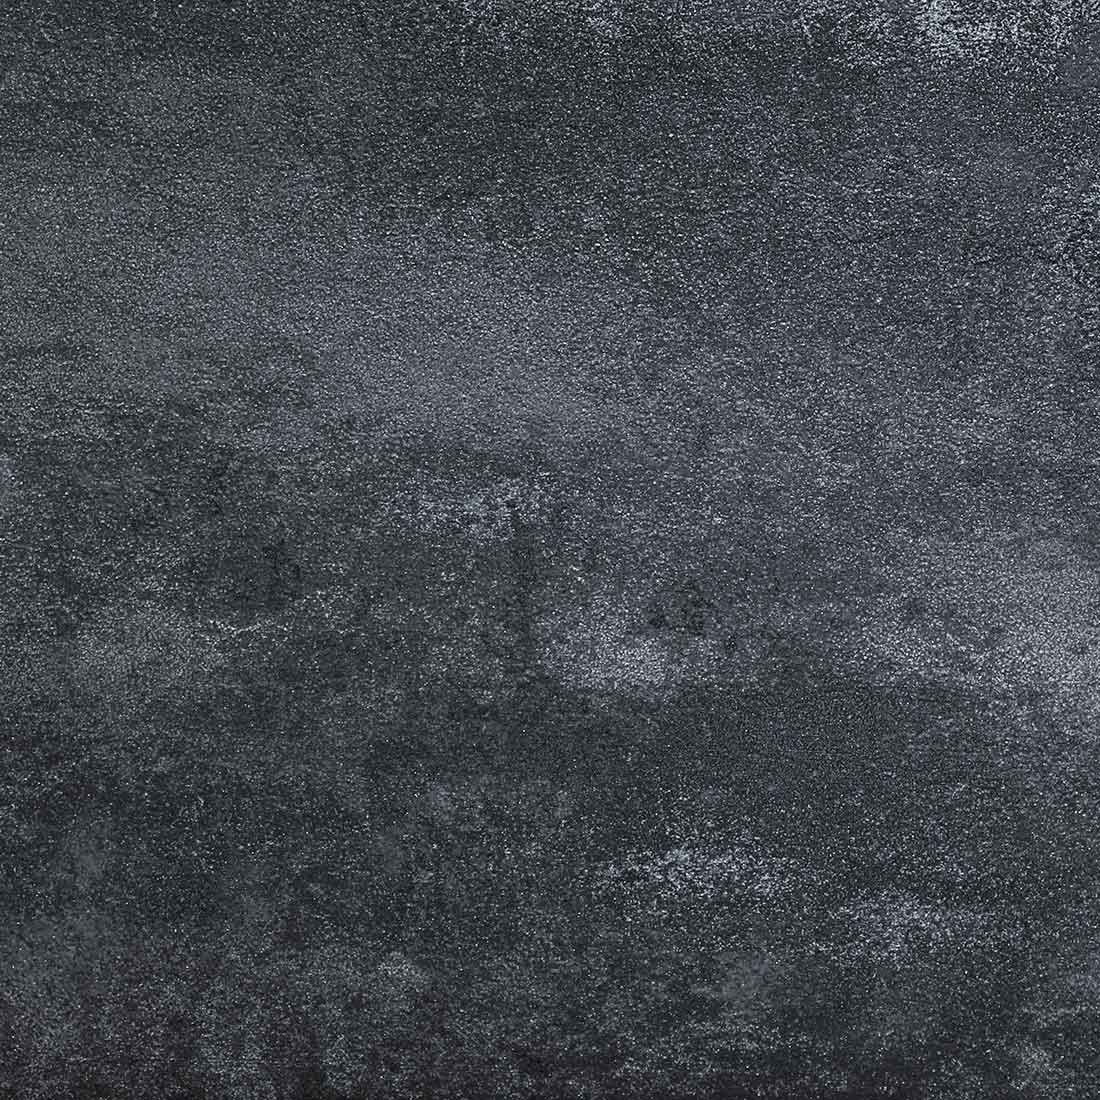 Béton gris anthracite